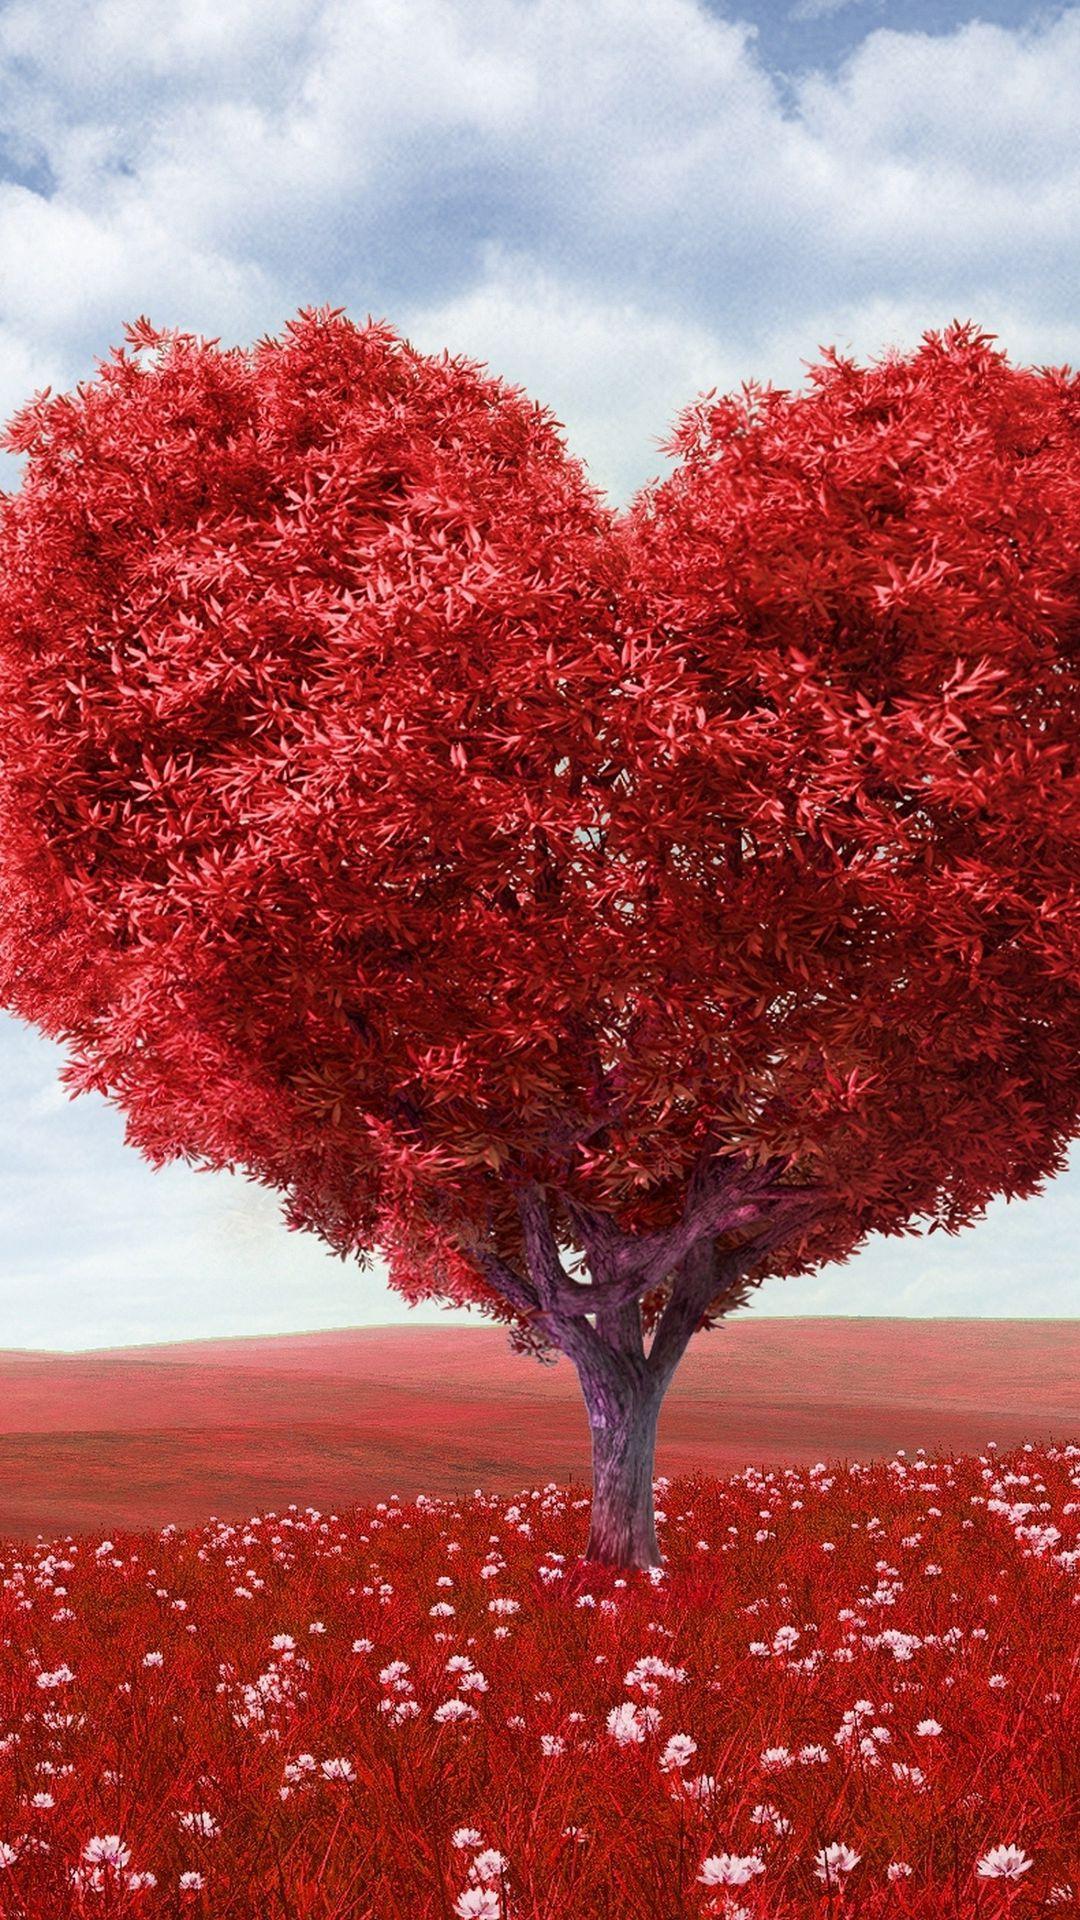 1080x1920 Wallpaper tree, heart, photoshop, field, grass, romance